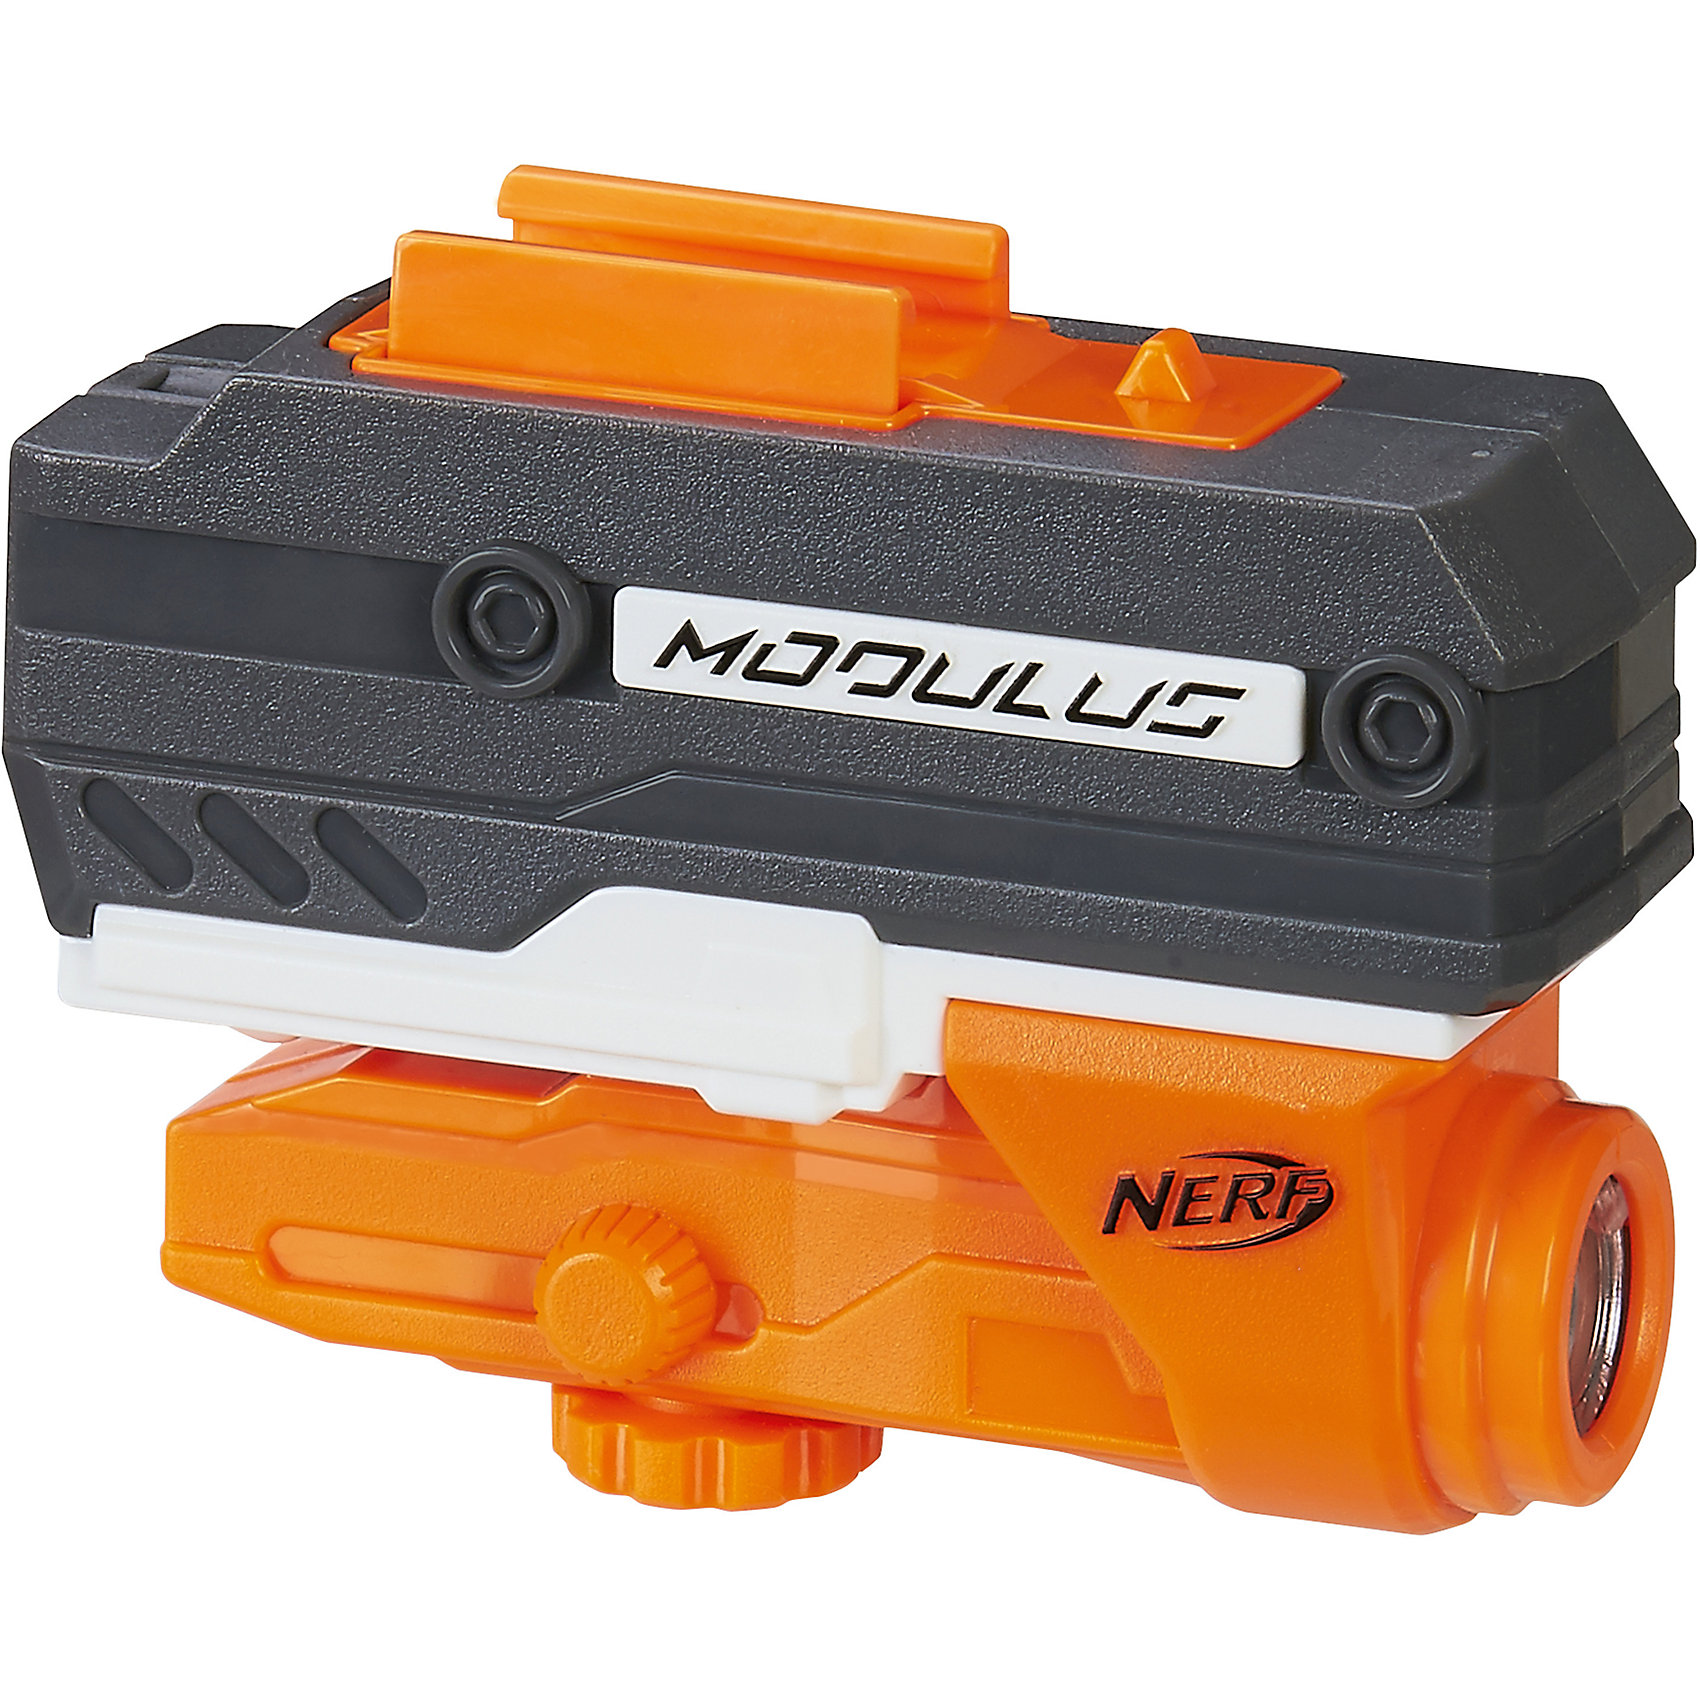 Аксессуары, NERF Modulus, B6321/B7170